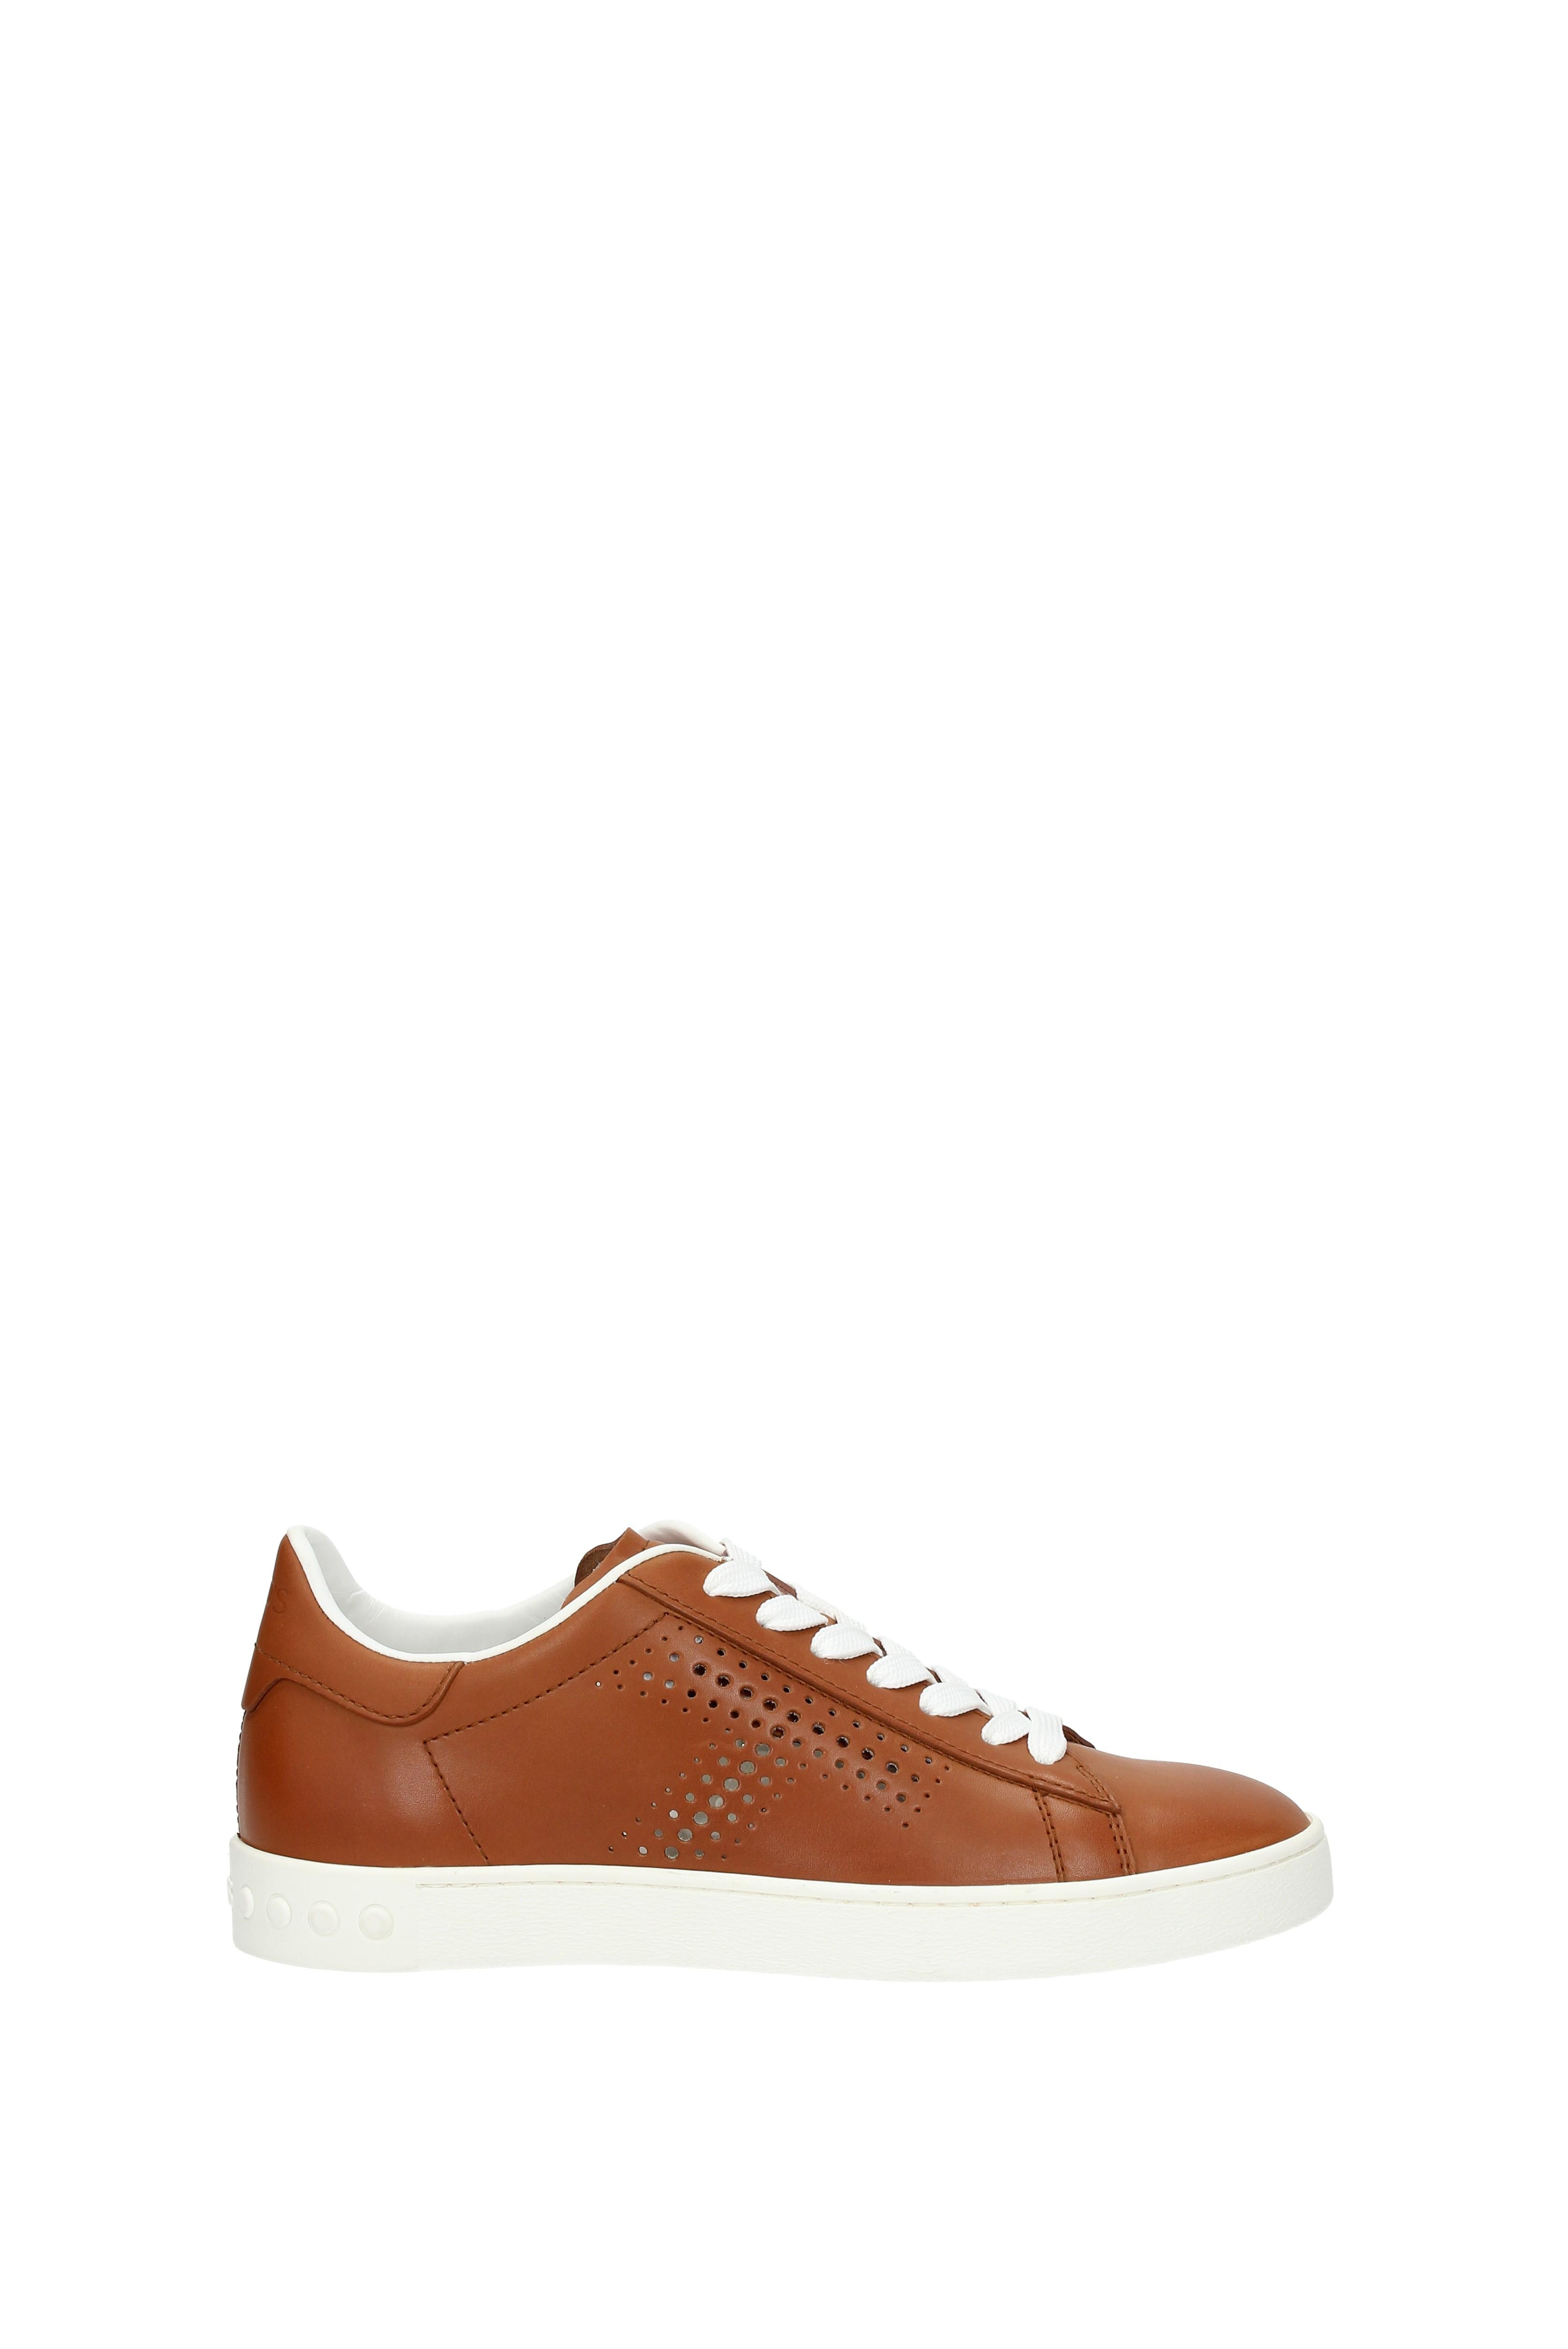 Sneakers Tod's Damens - Leder Leder - (XXW12A0T490D90) f23209